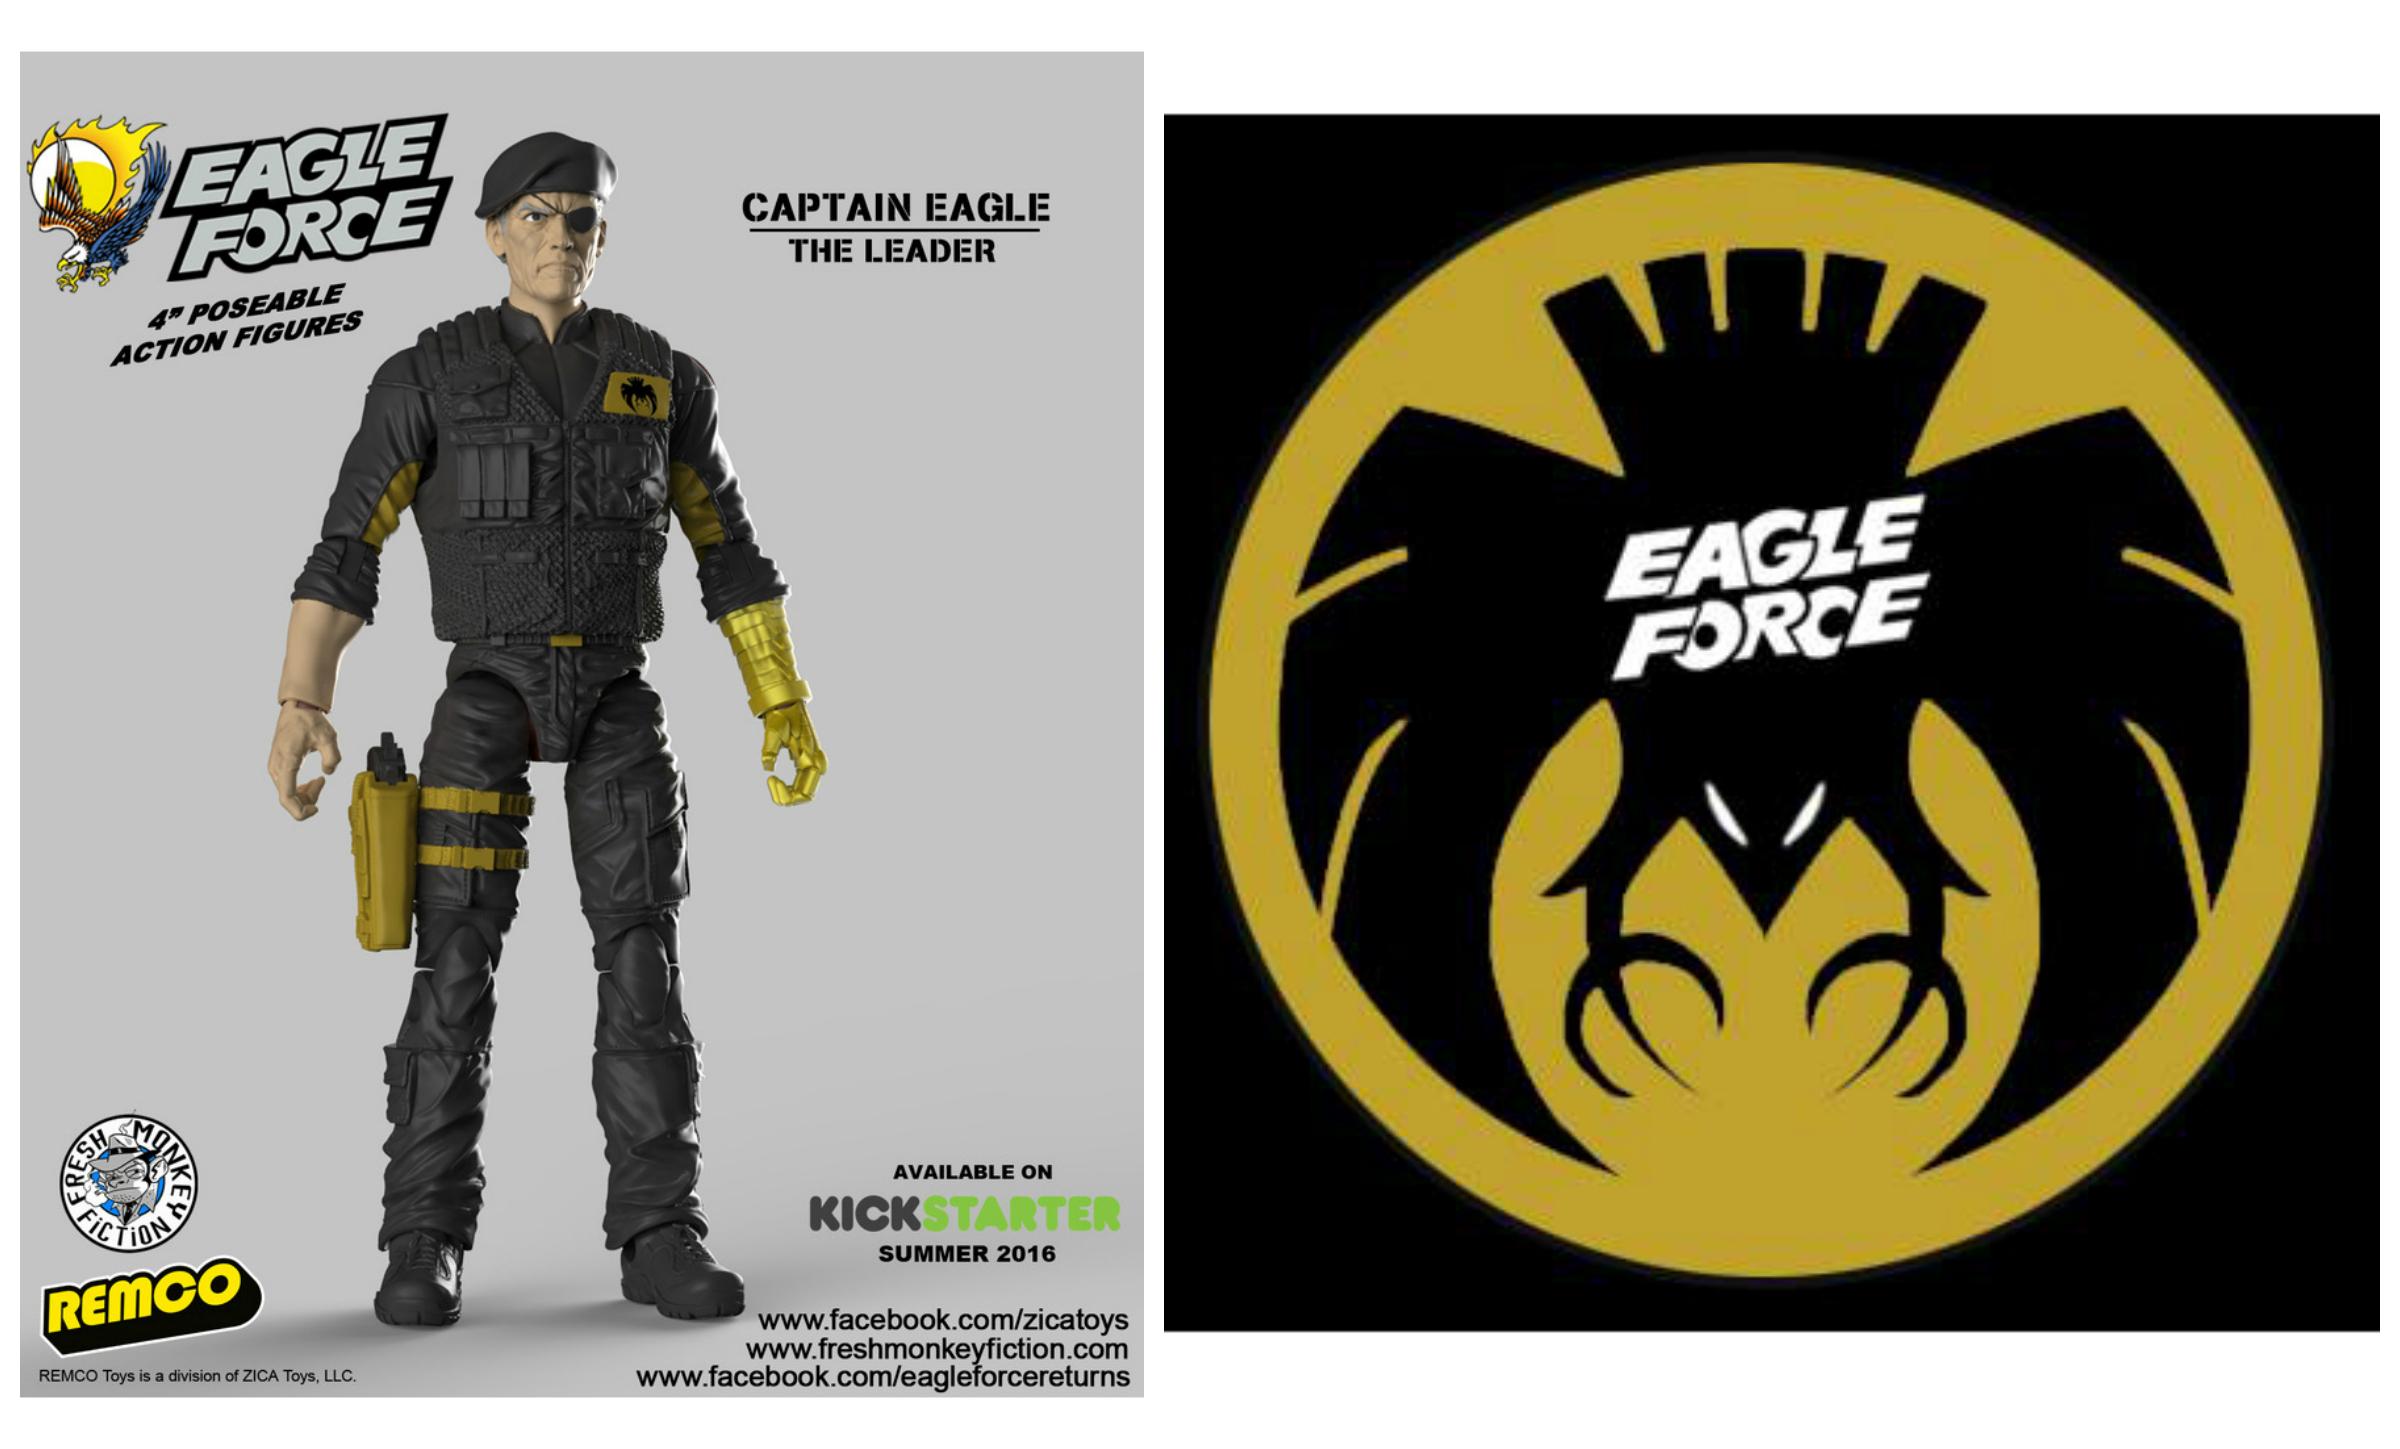 eagle force returns captain eagle color image now available